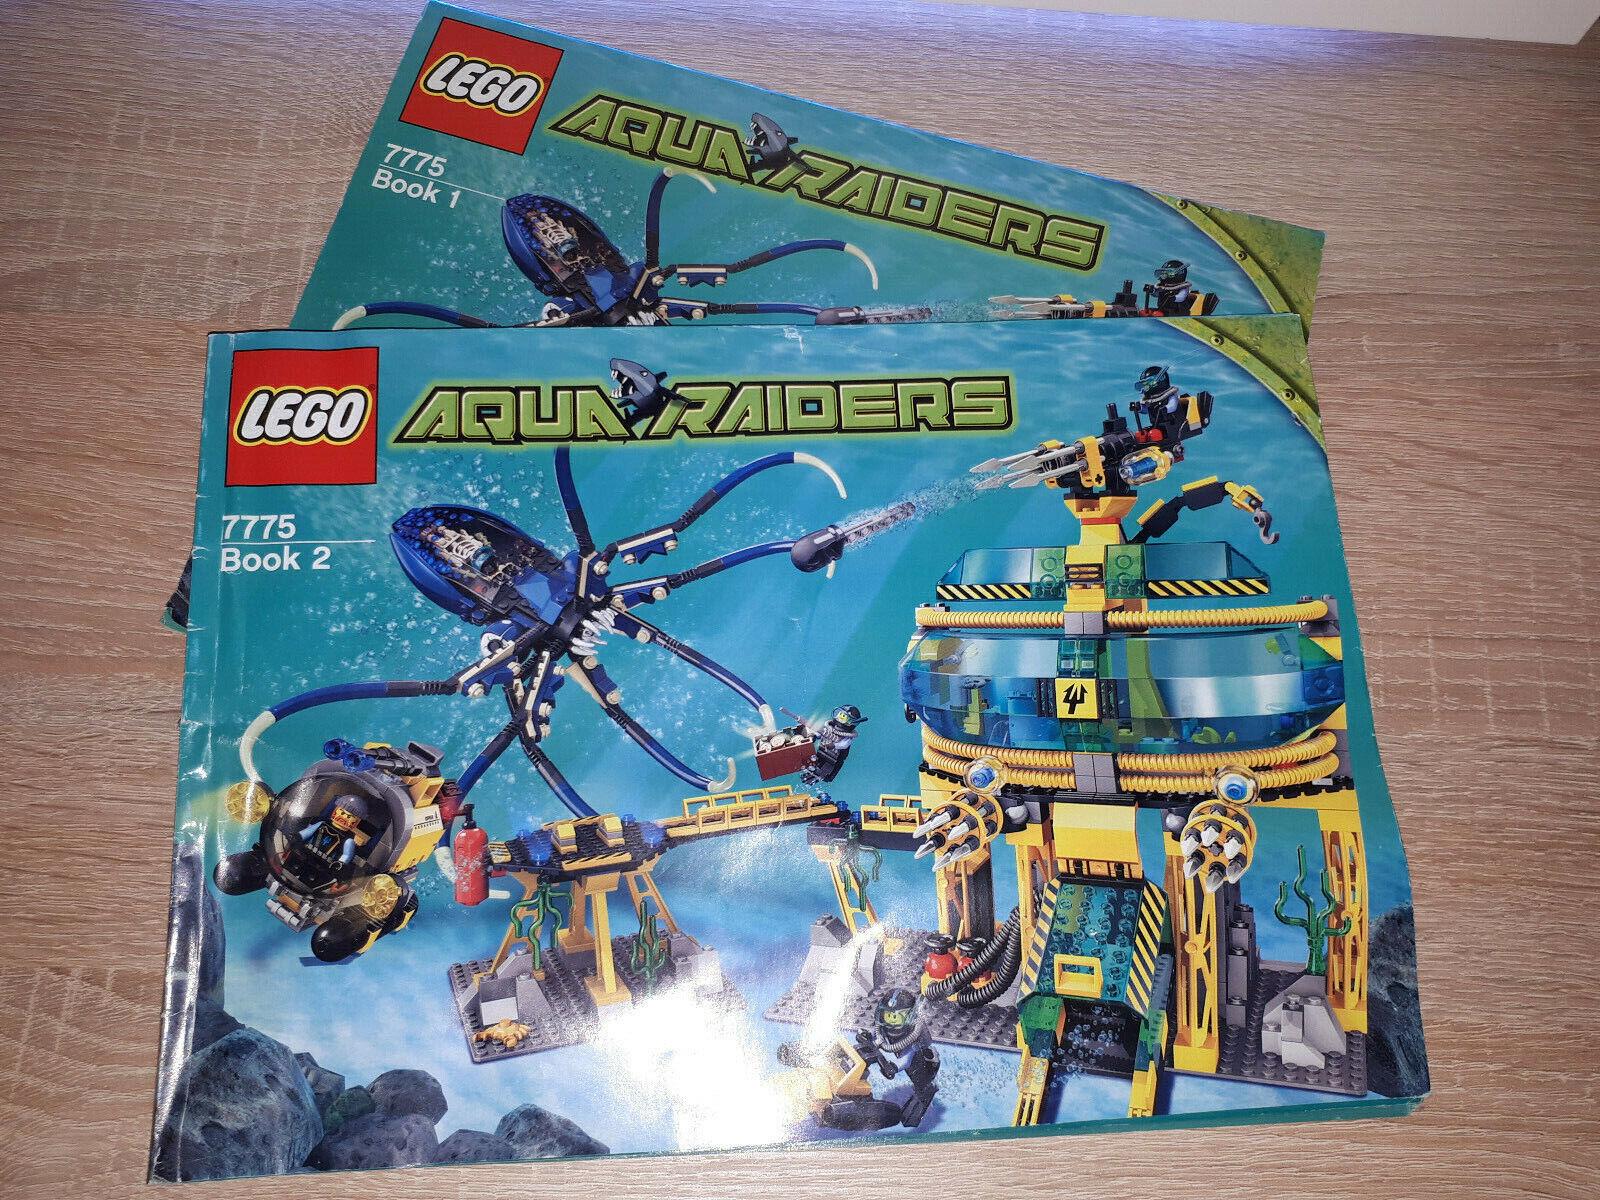 Lego Lego Lego Aqua Raiders 7775 Aqua Basisstation 795cb1